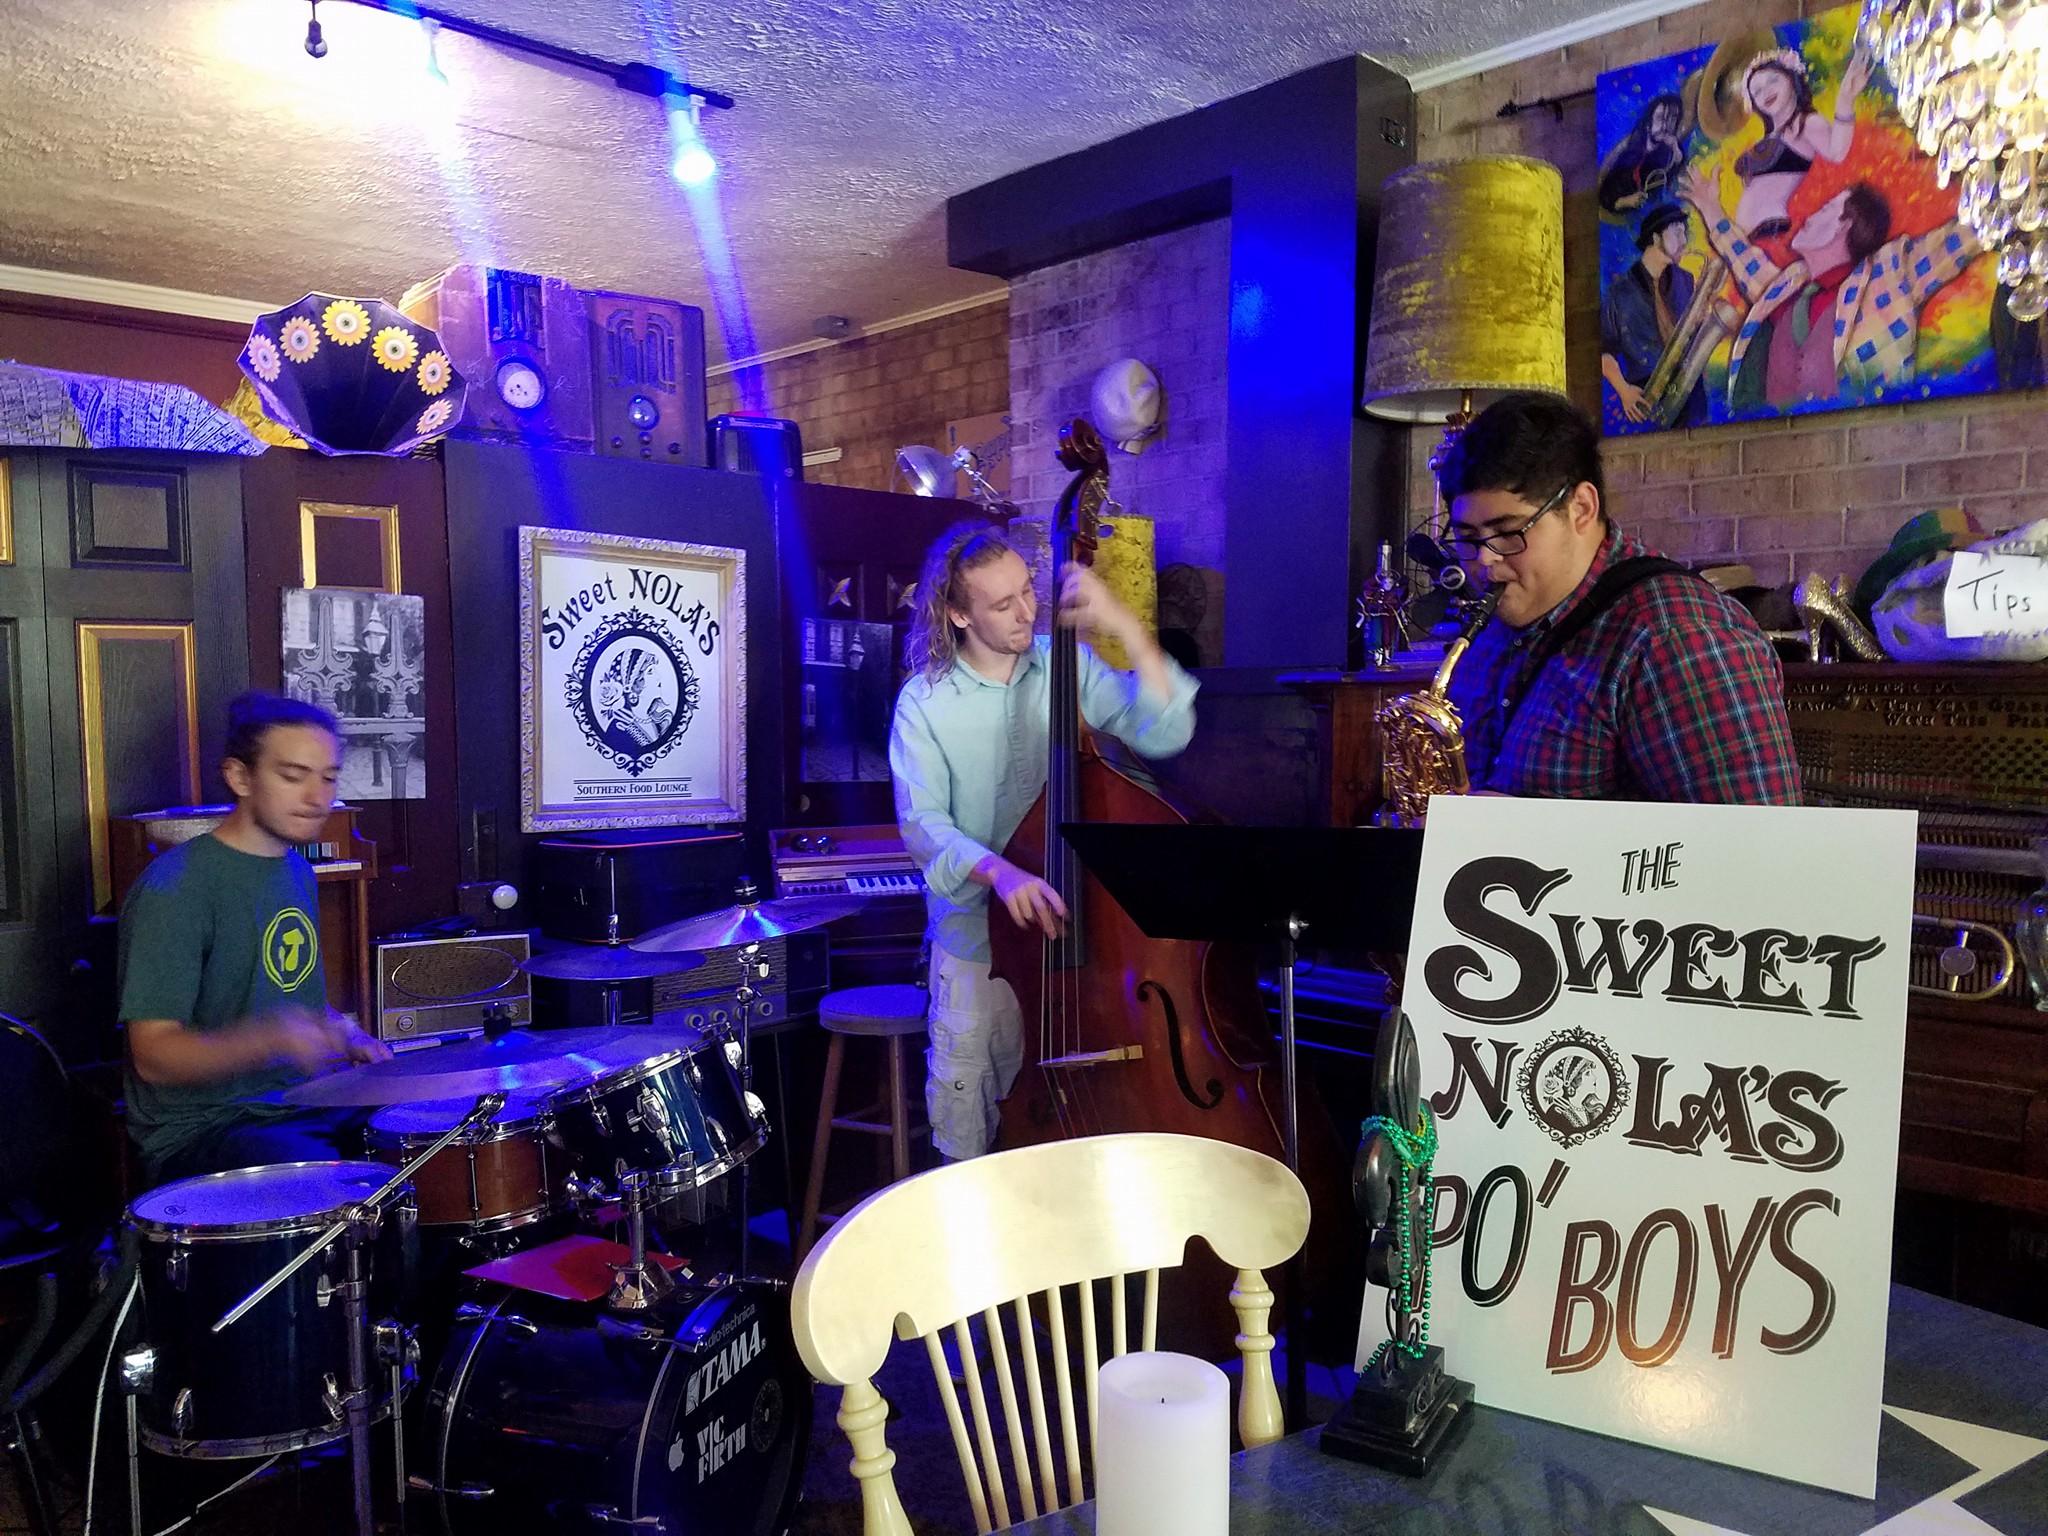 The Sweet NOLA's Po' Boys